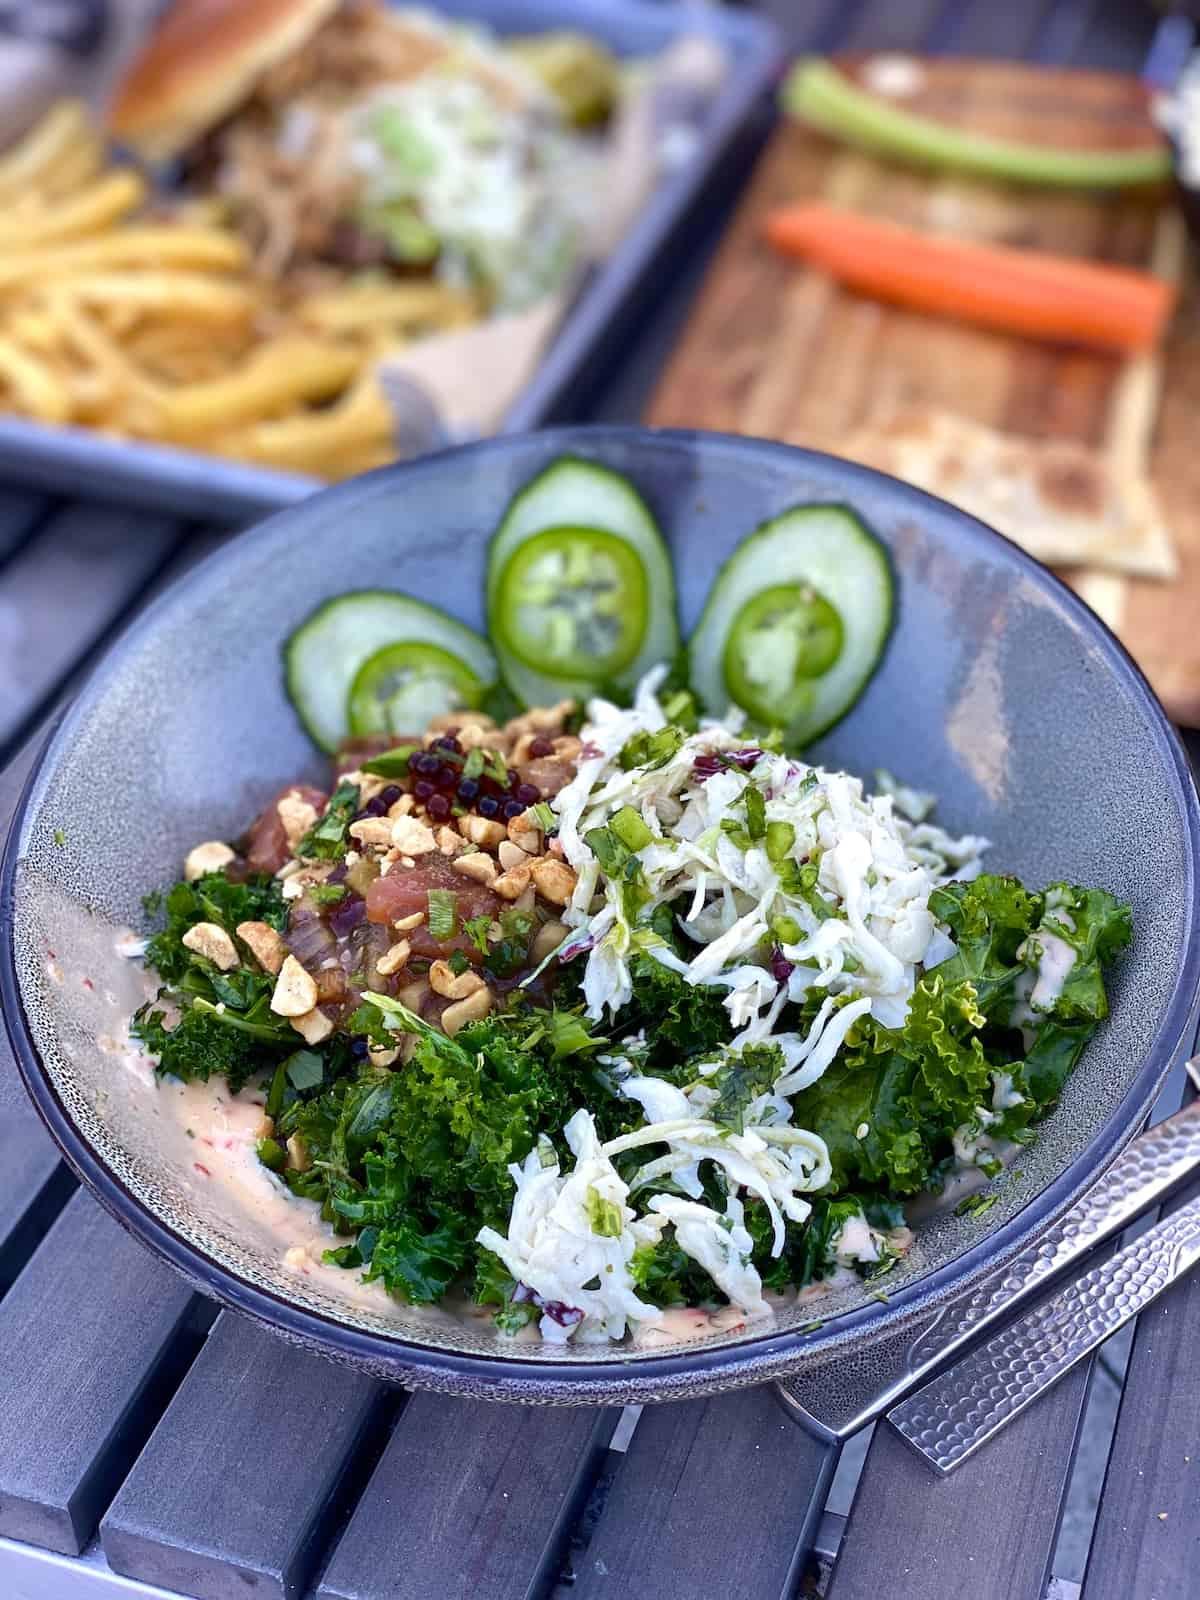 Fresh raw tuna and kale salad with veggies and nuts.